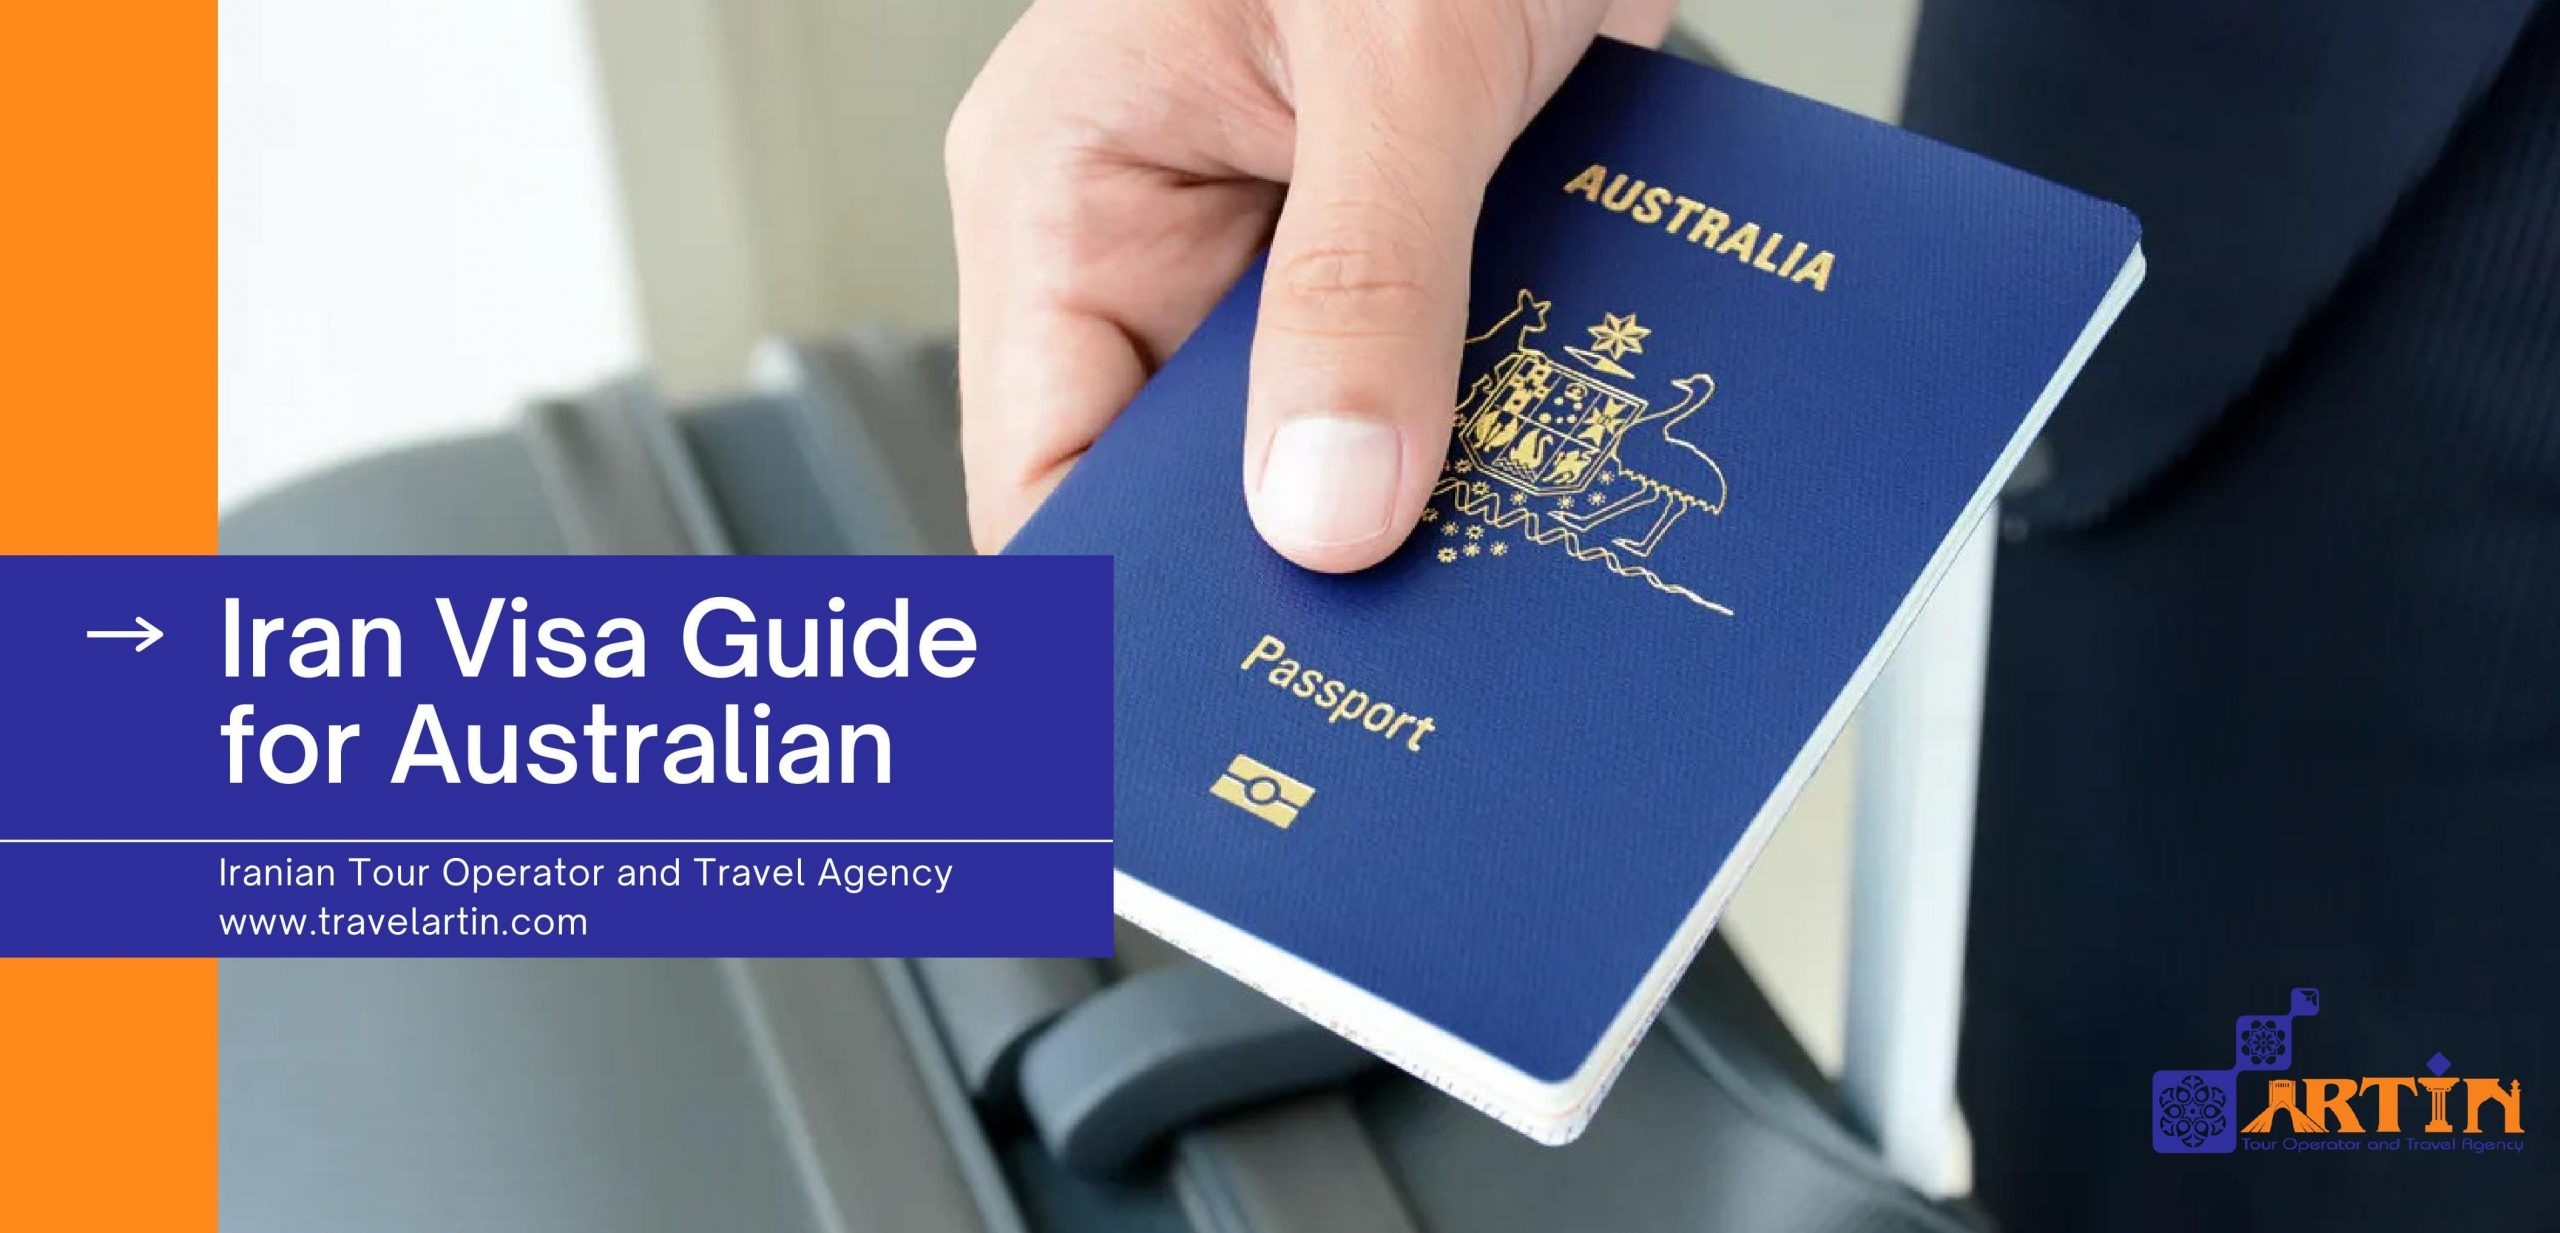 Iran visa guide for Australian- travelartin.com